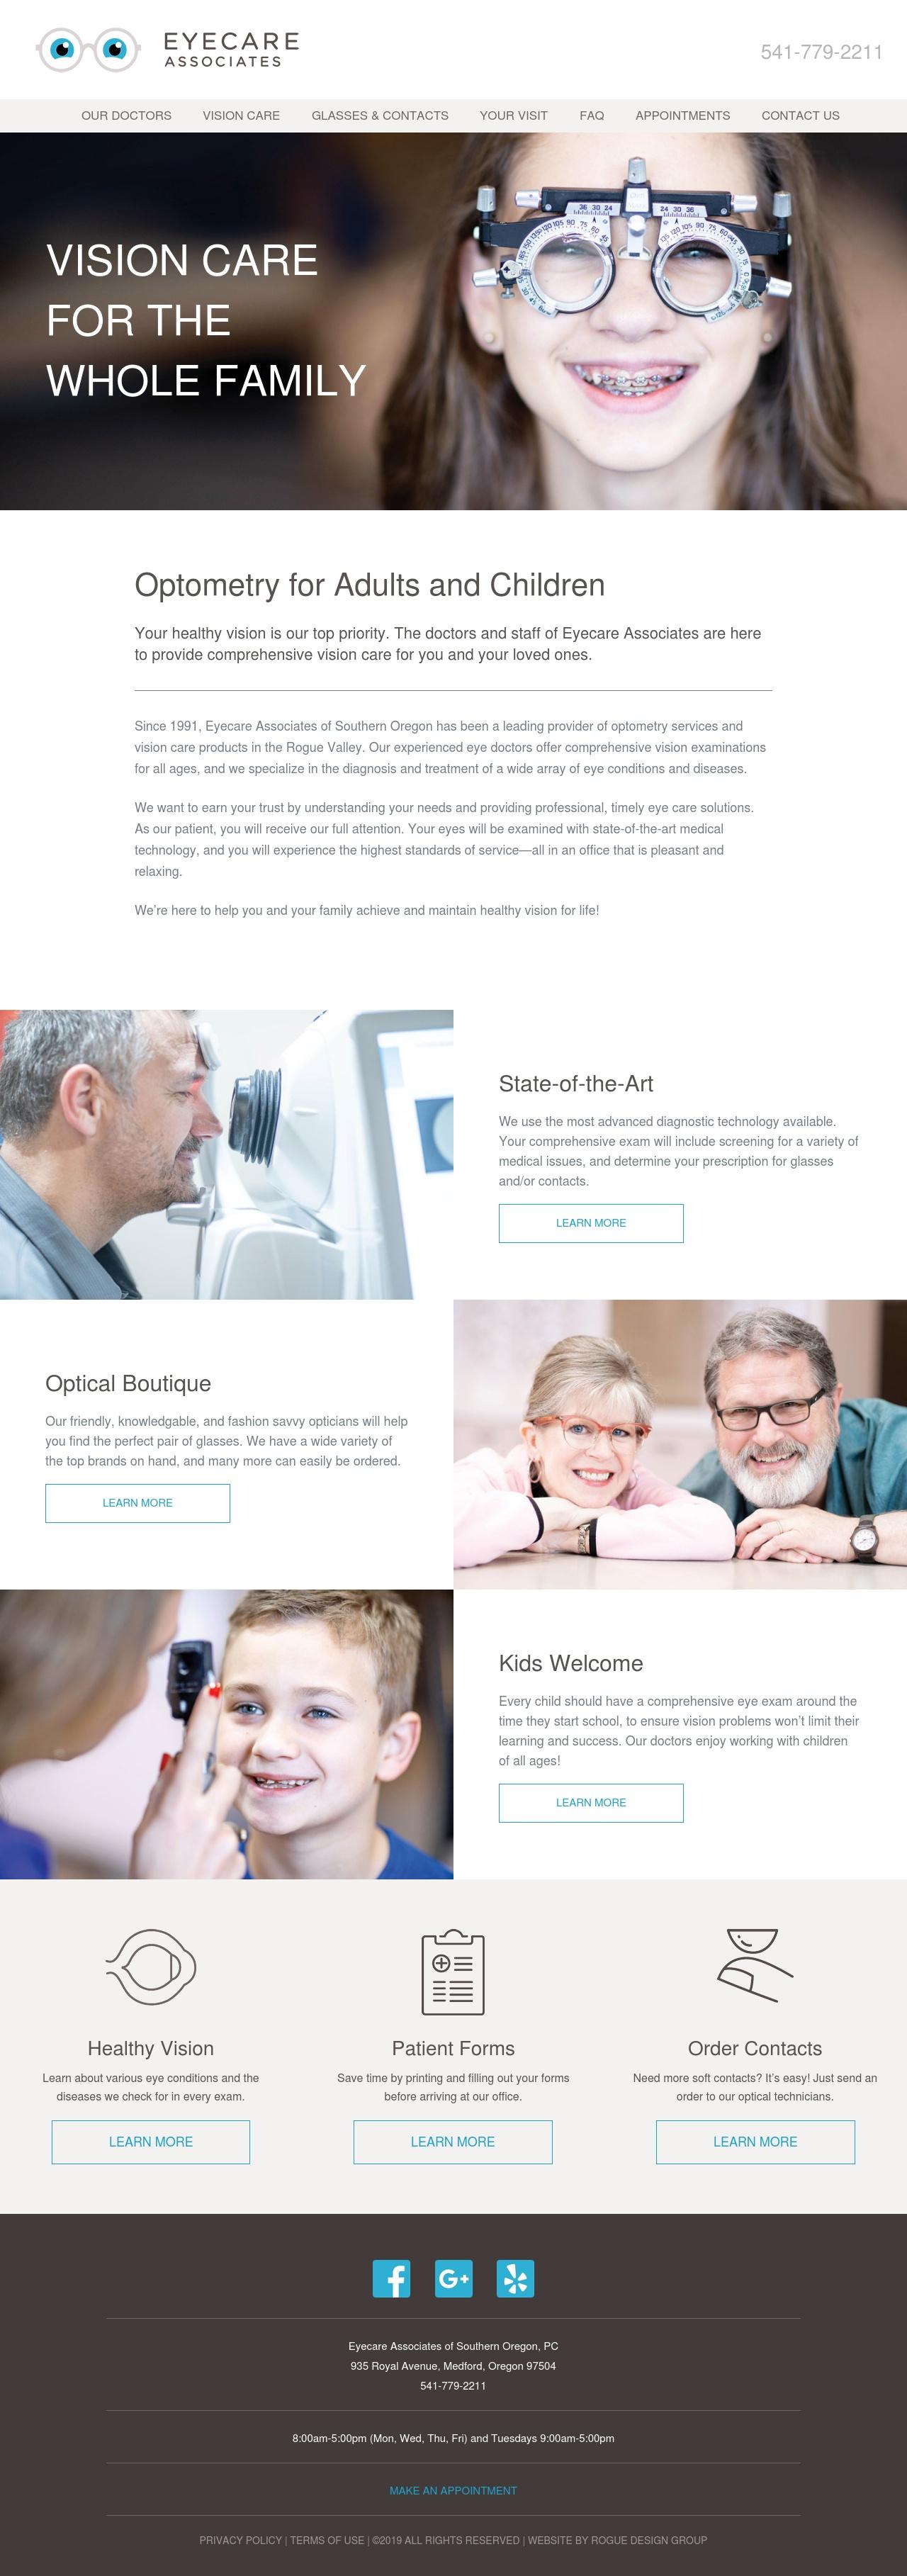 Southern Oregon Eyecare Associates